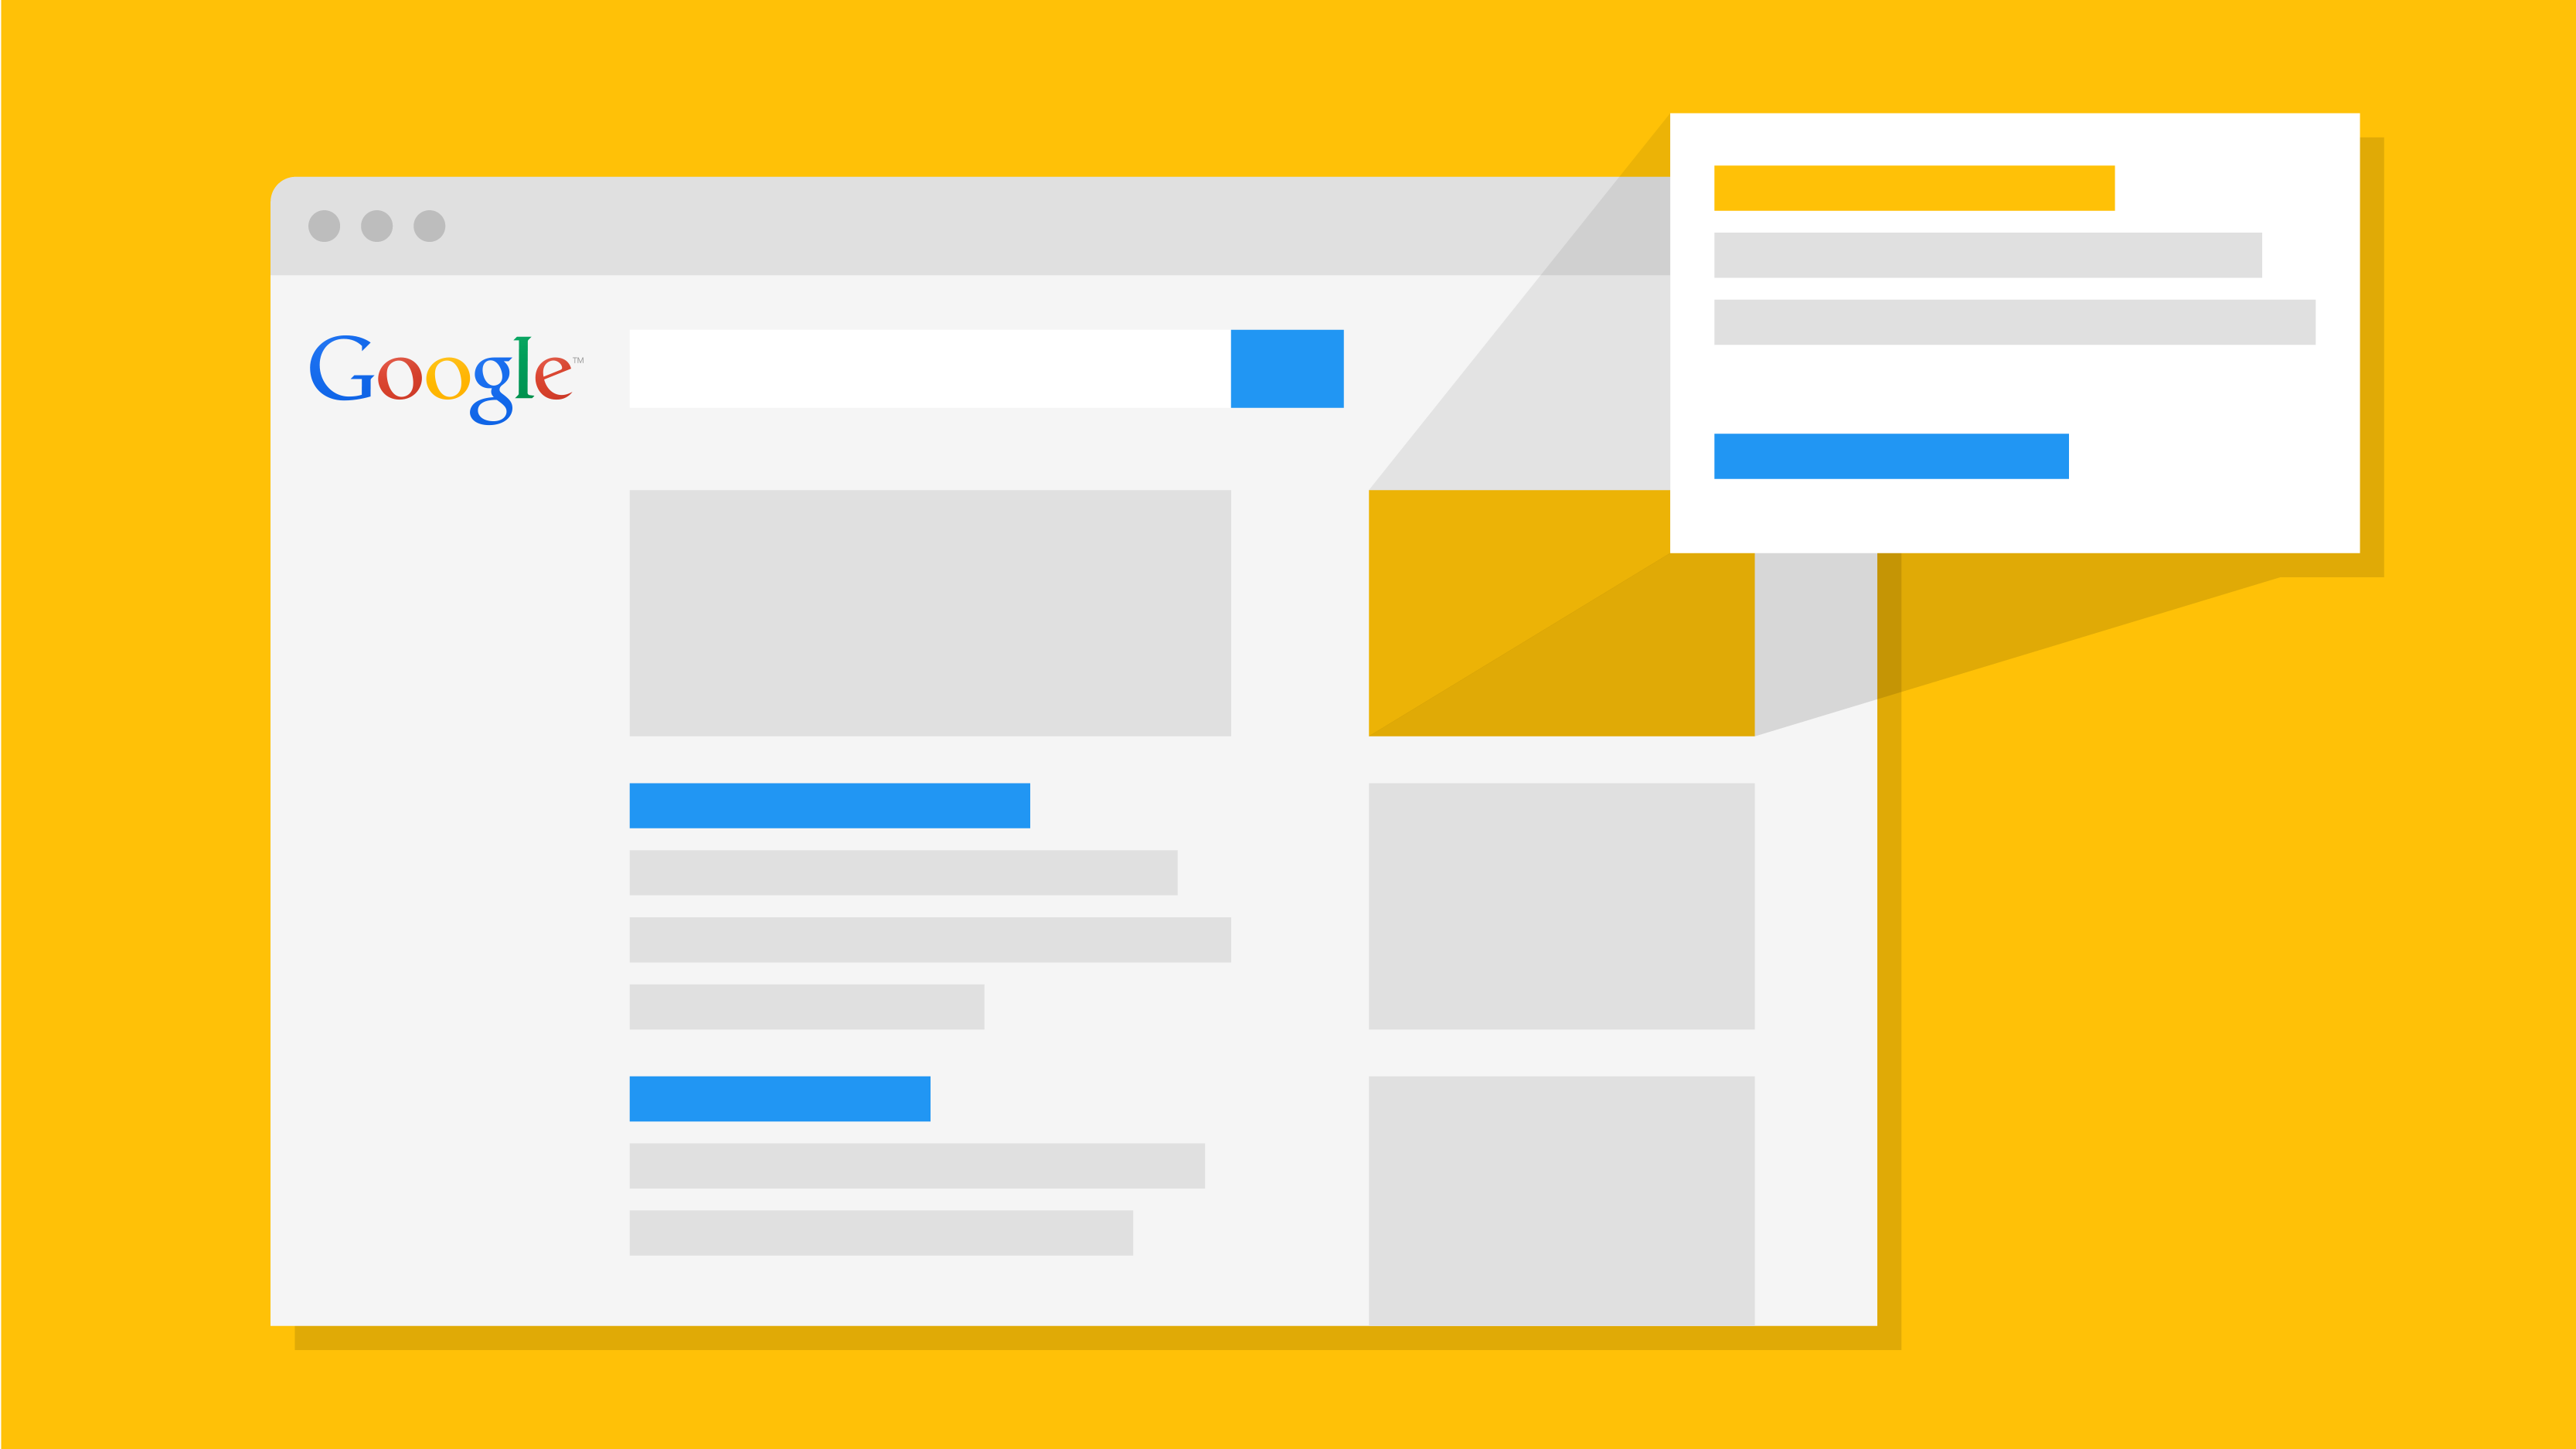 ⇒Comment obtenir un code promo Google Adwords | Code Promo Google